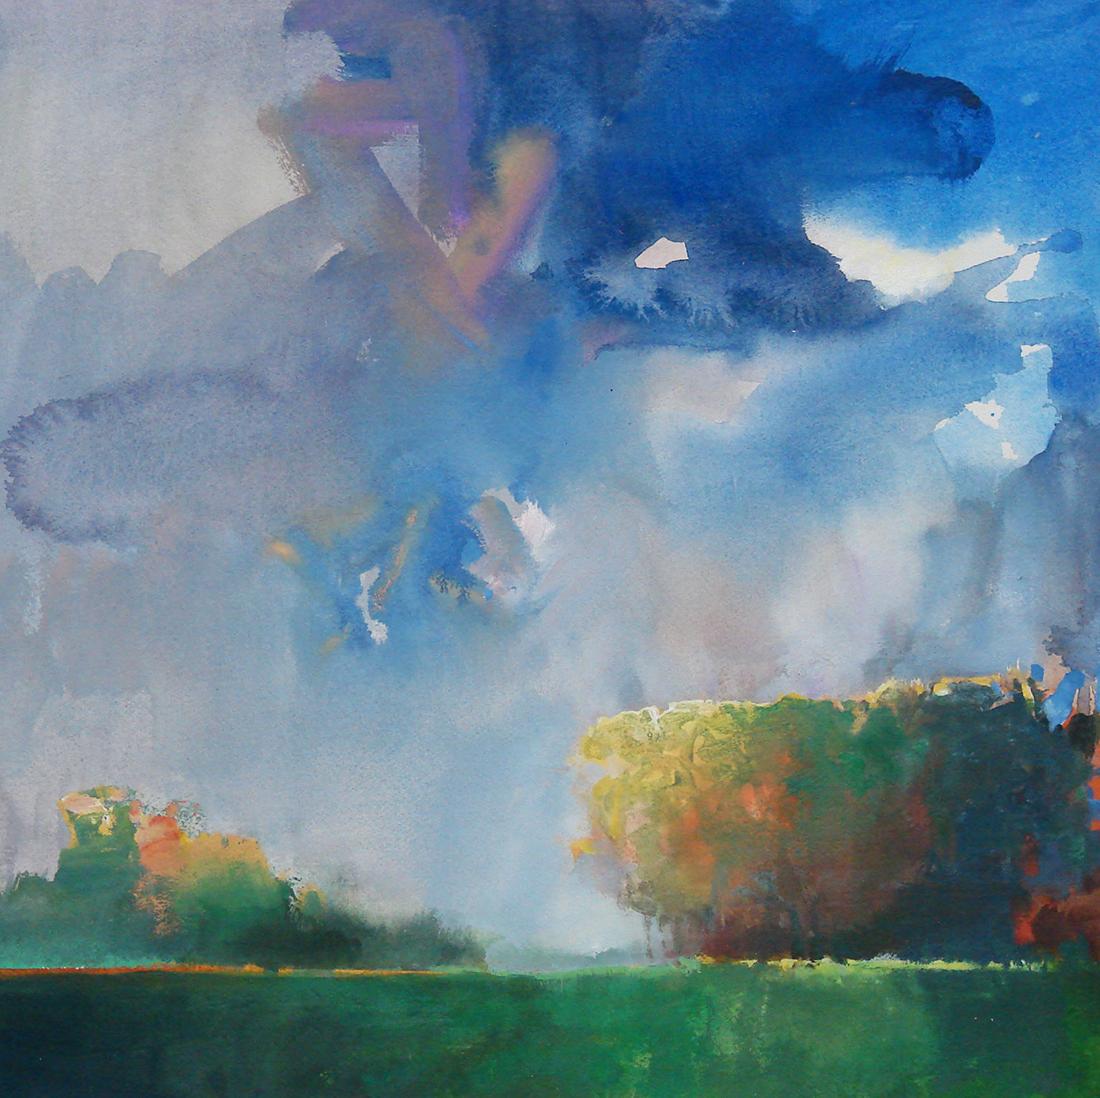 Randall David Tipton - Online Exhibition